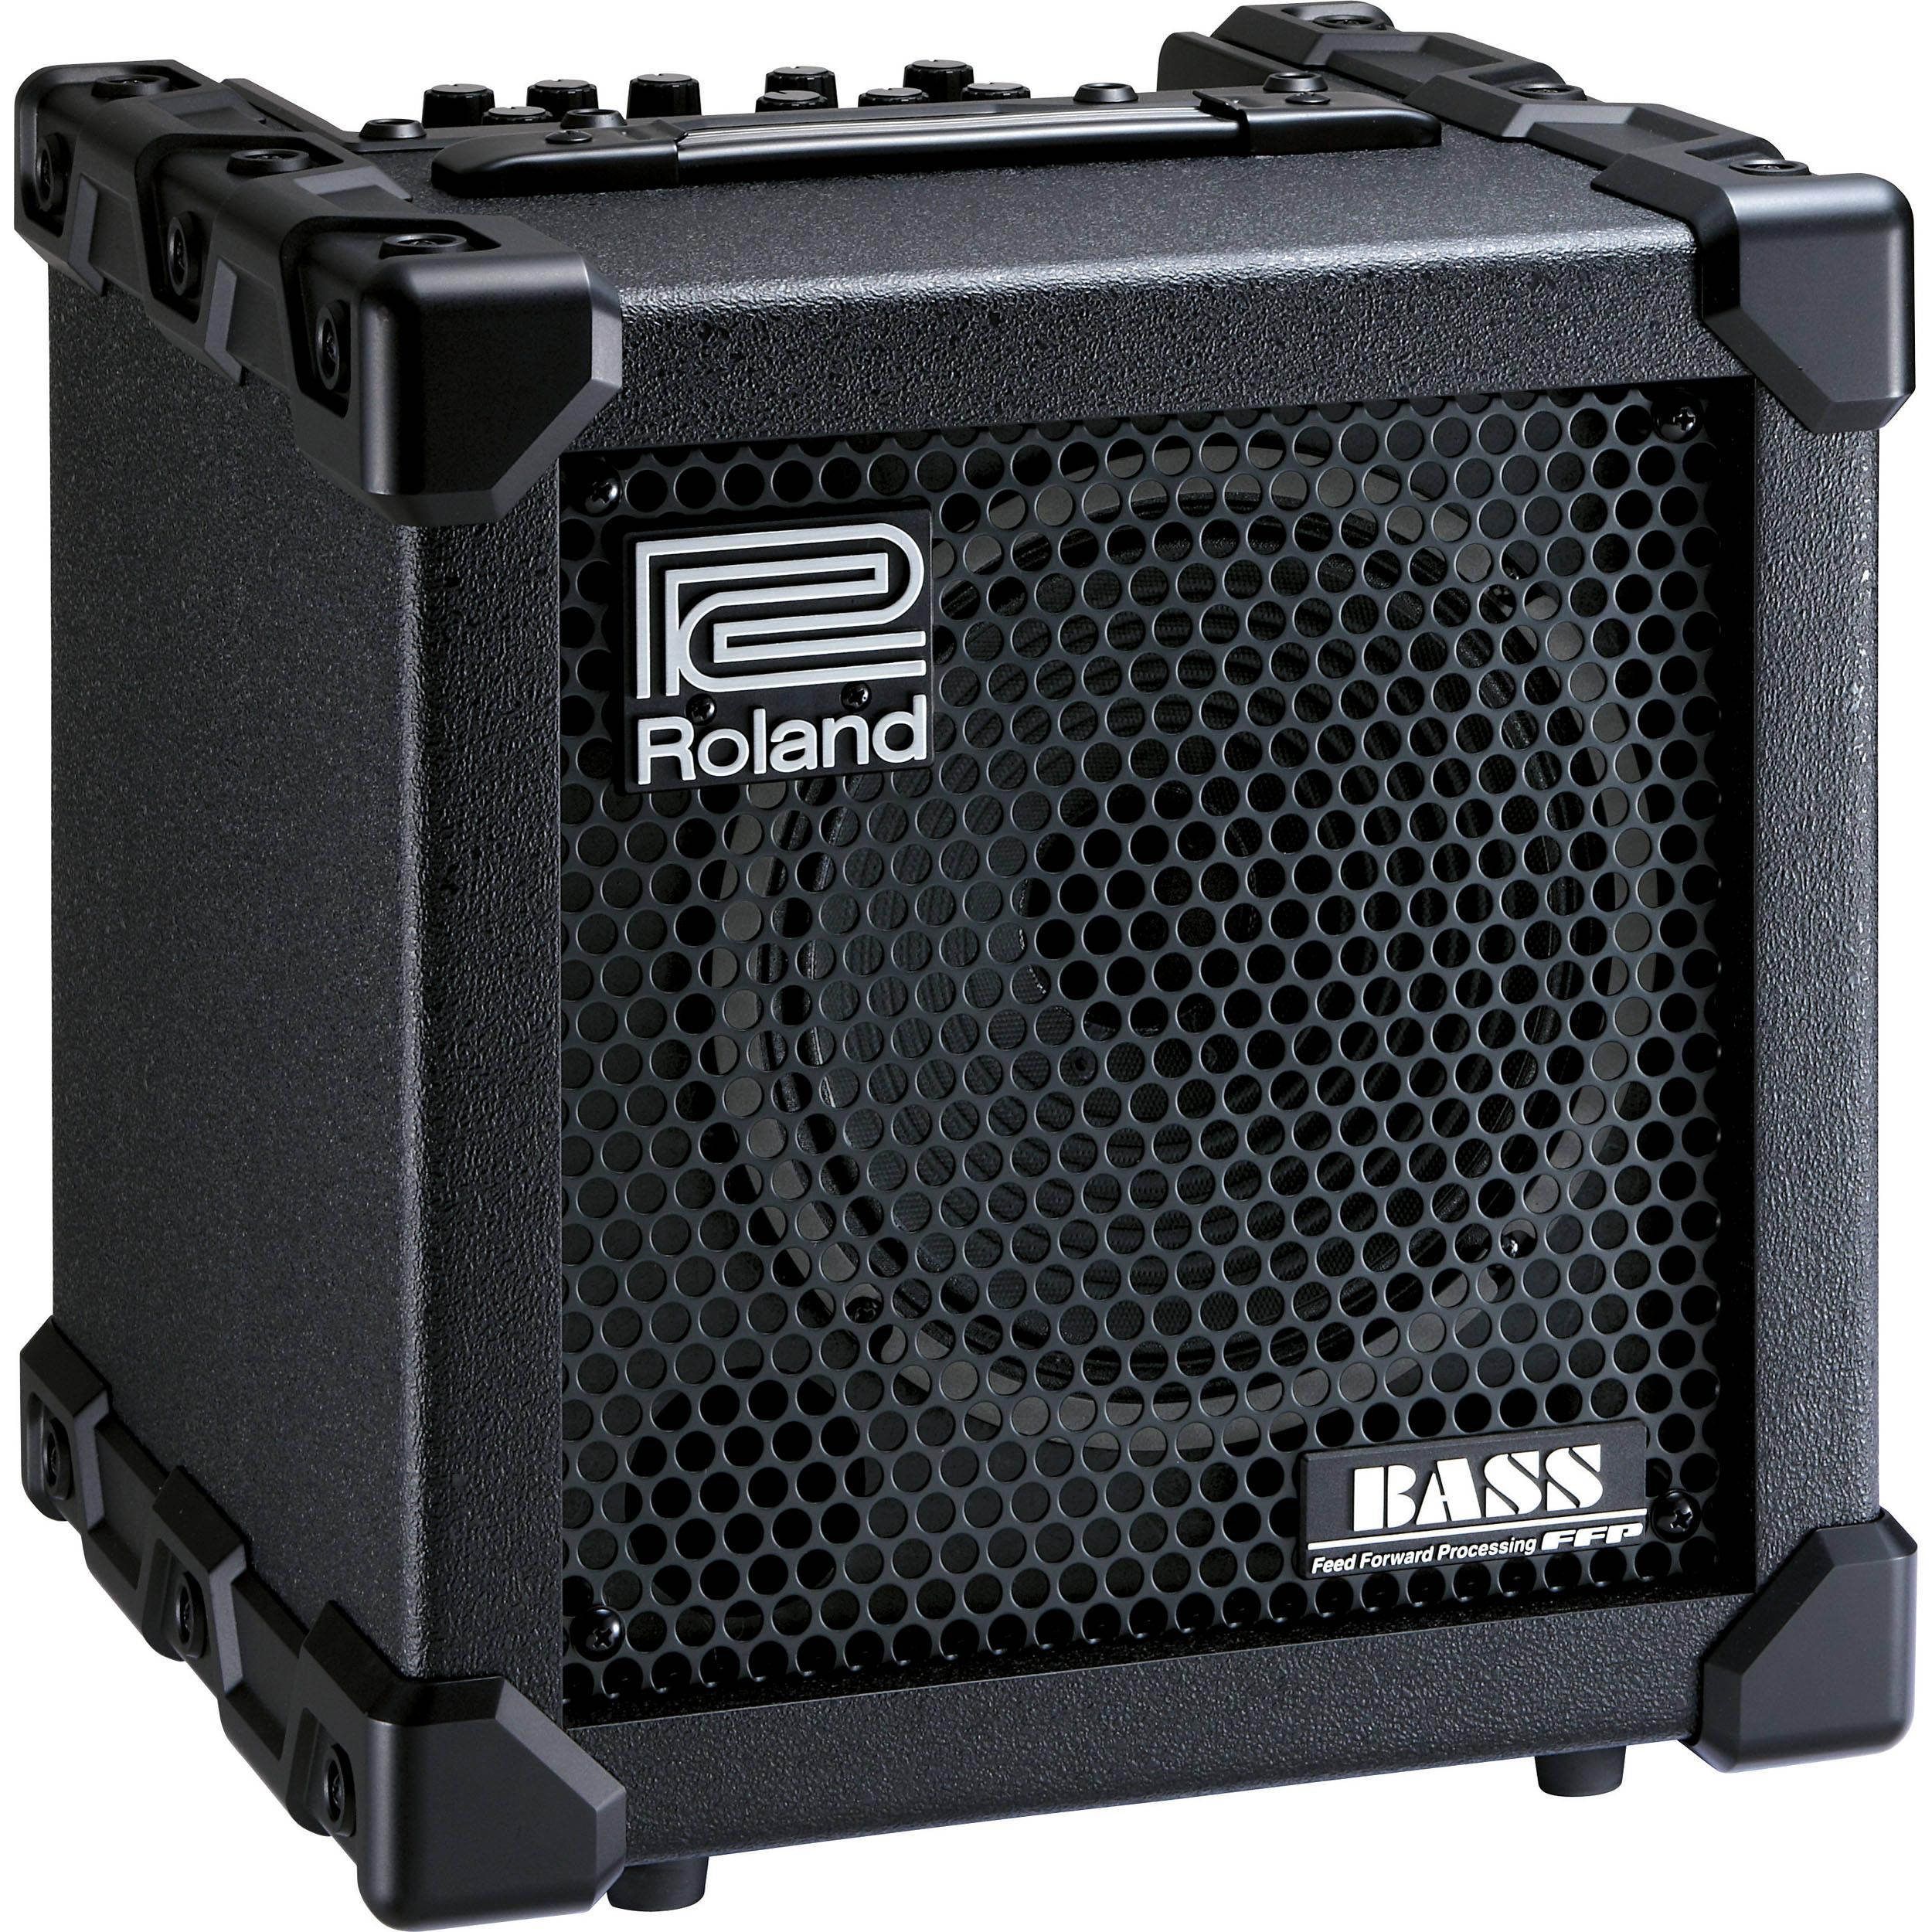 roland cube 20xl bass compact bass amplifier speaker cb 20xl. Black Bedroom Furniture Sets. Home Design Ideas